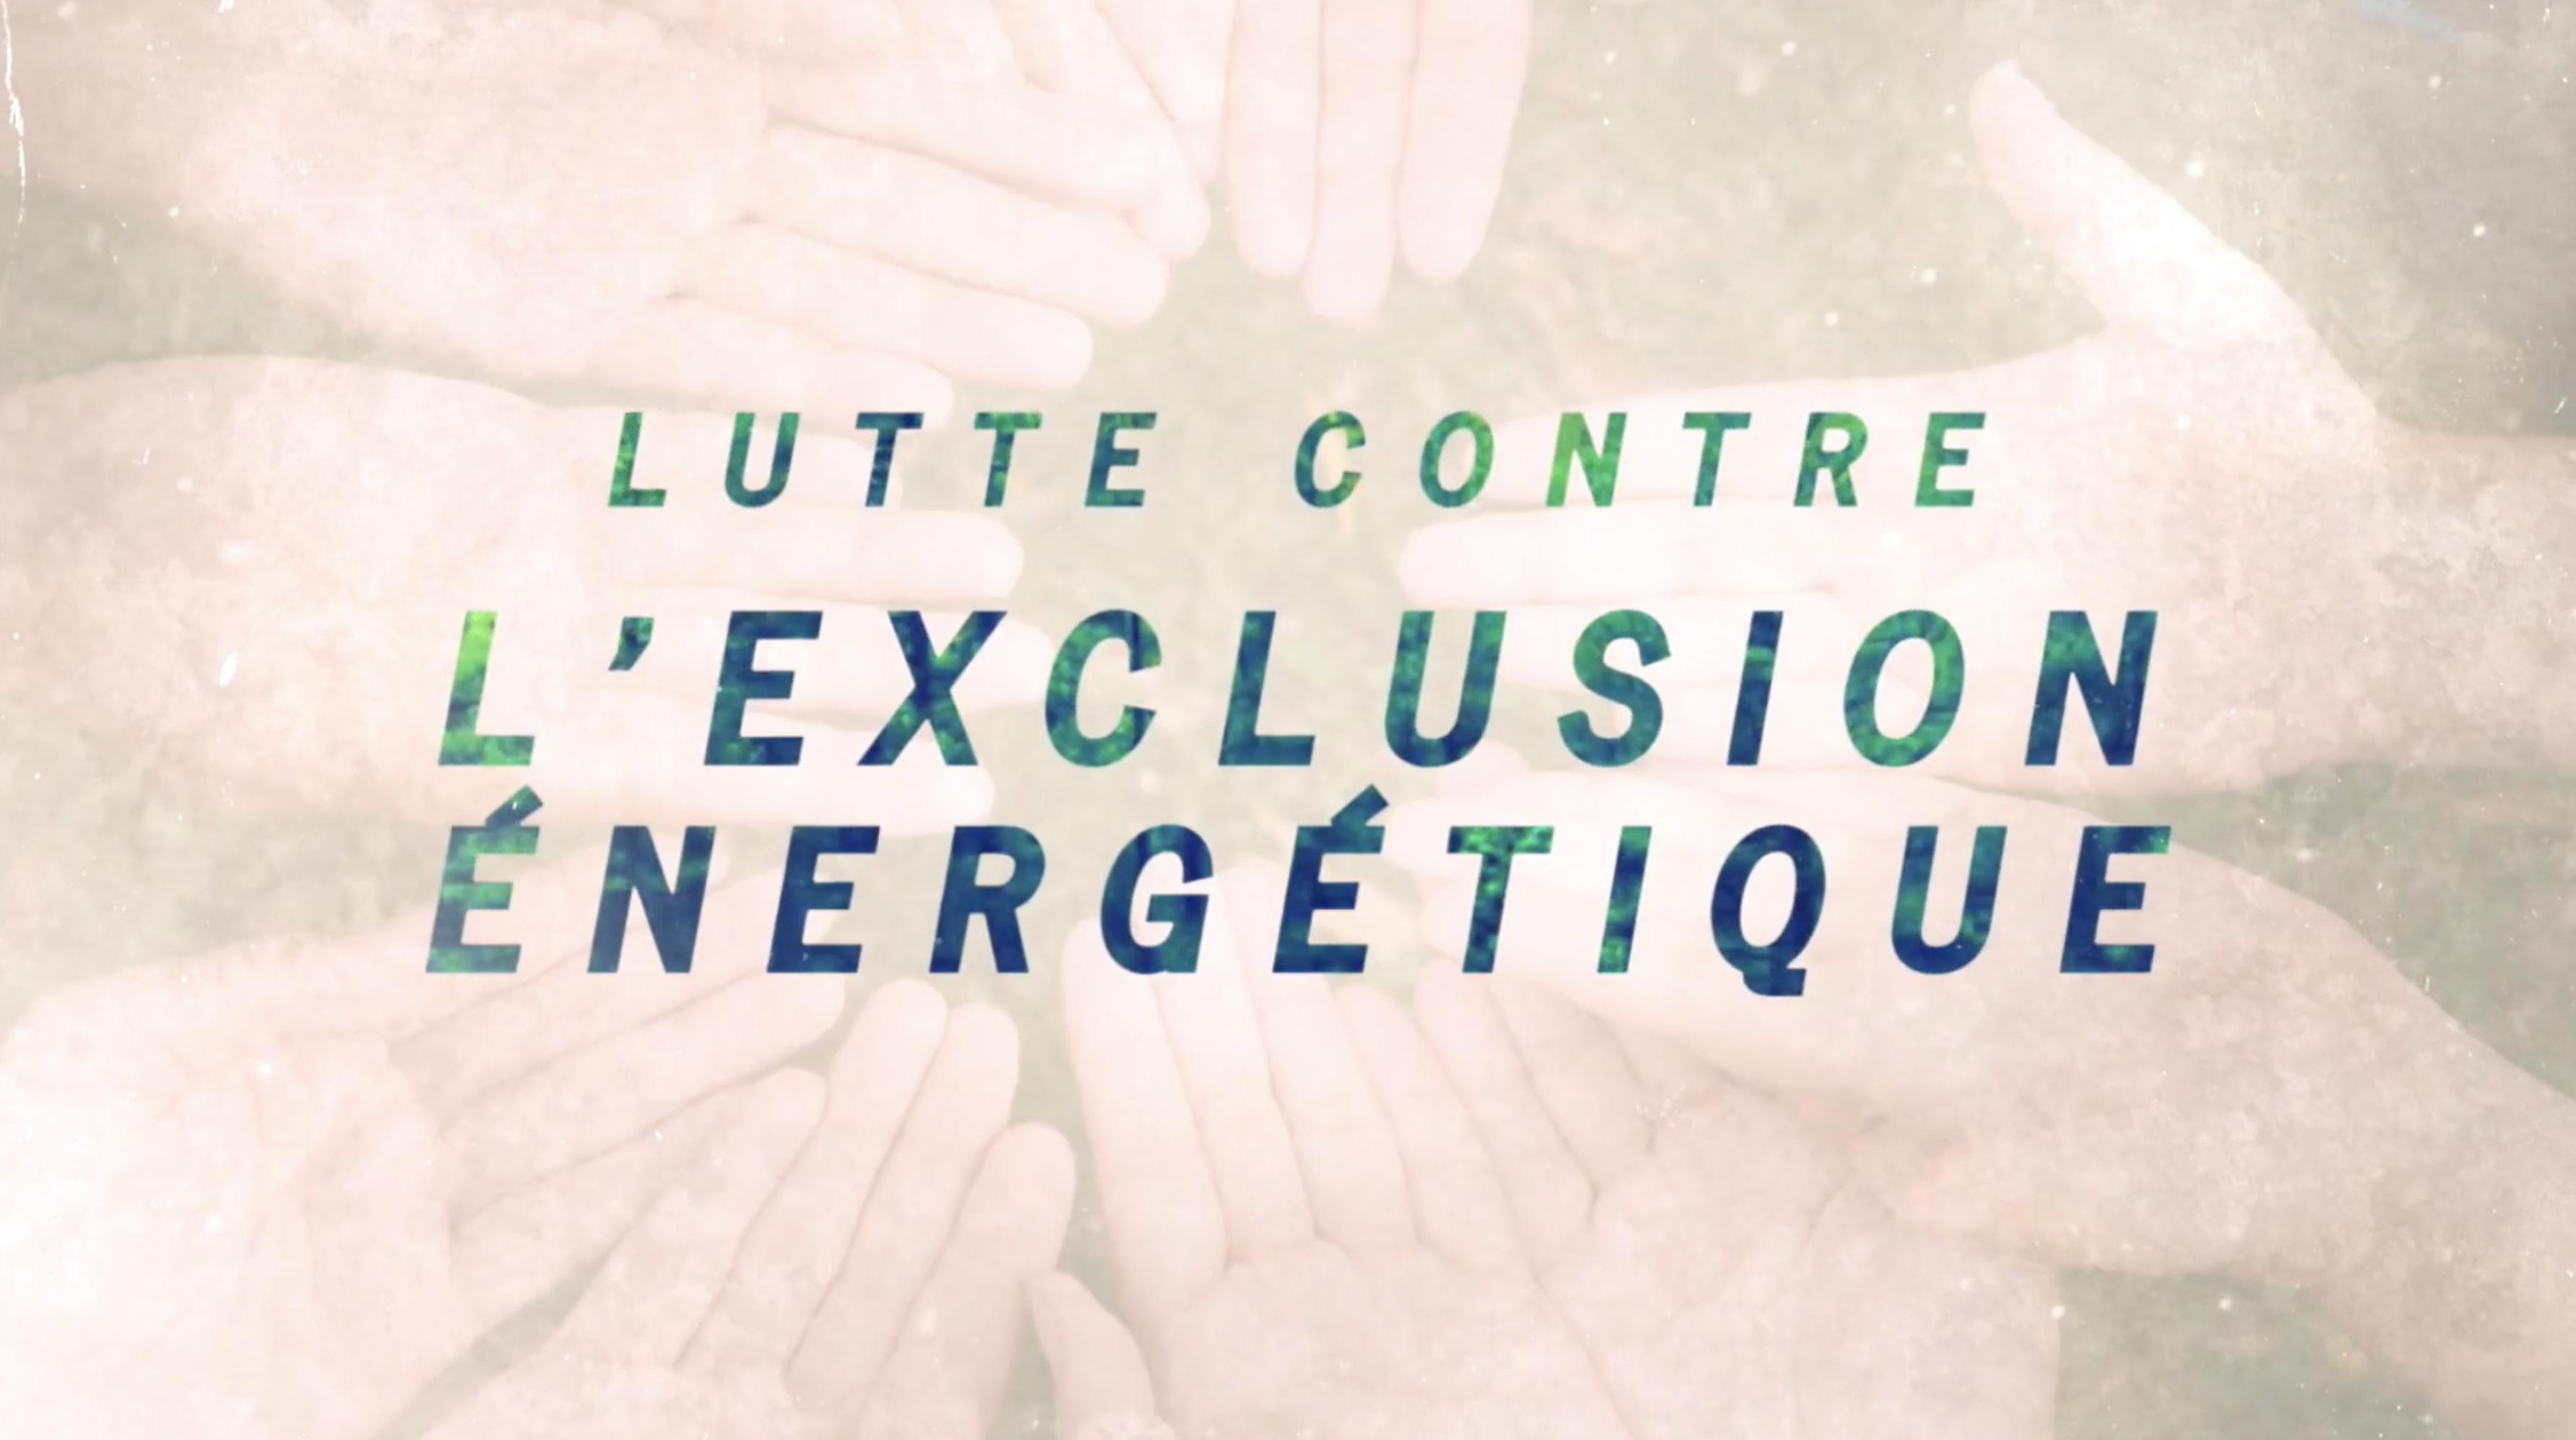 #StopExclusionEnergetique